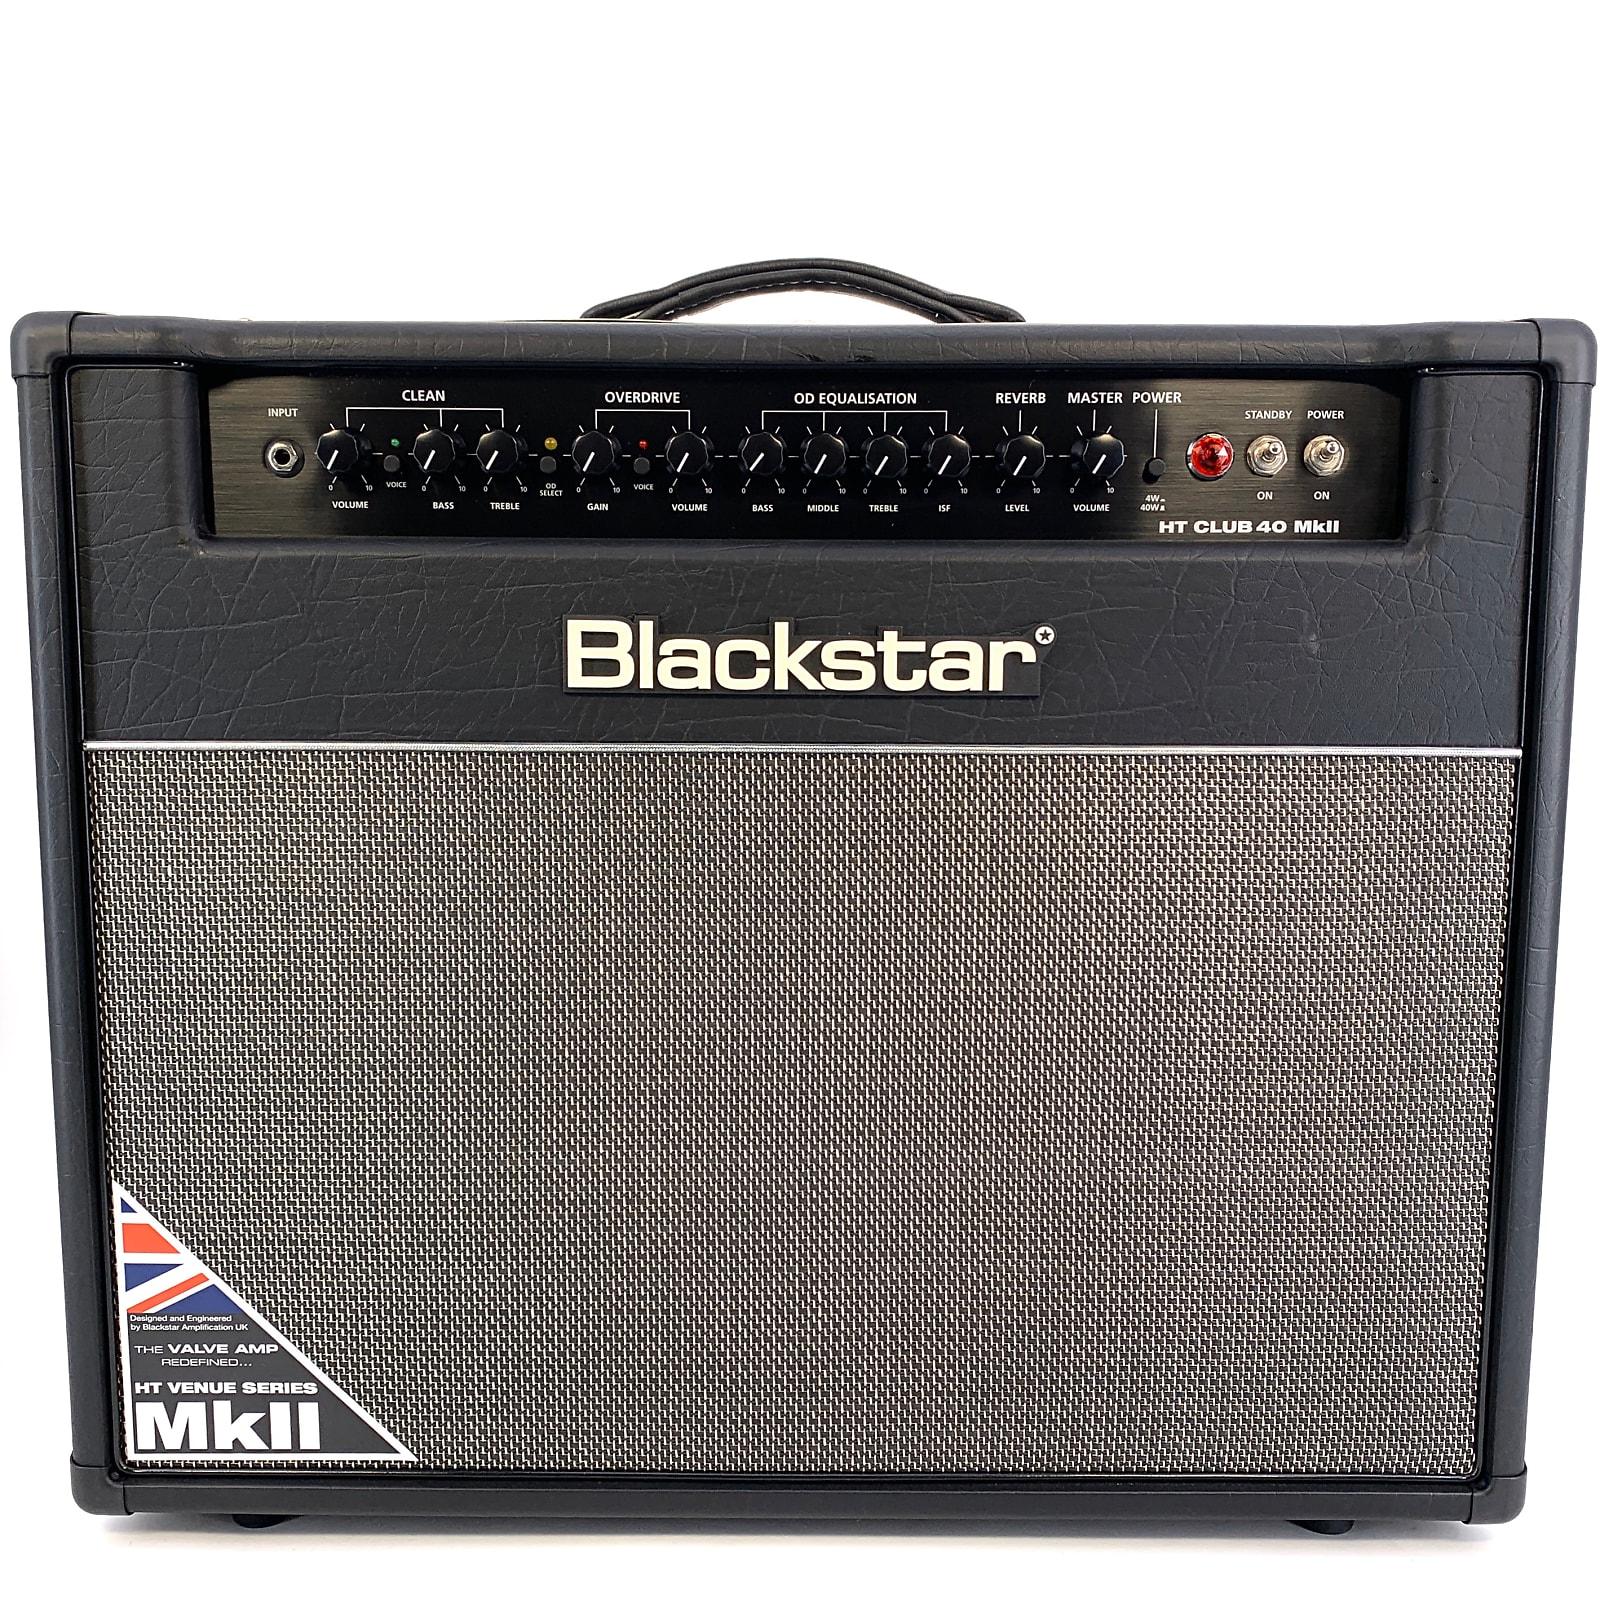 "Blackstar HT Club 40 Mark II 1x12"" 40-watt Tube Combo Amp - Brand New"